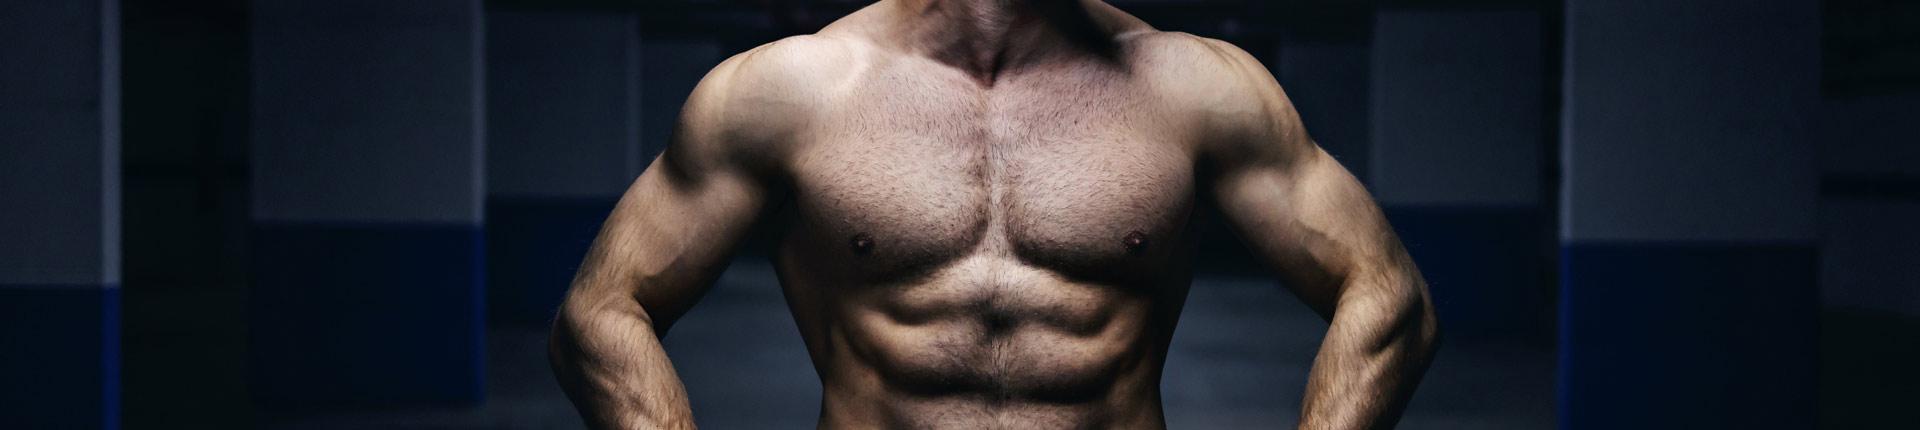 Jak urozmaicić trening mięśni klatki piersiowej?